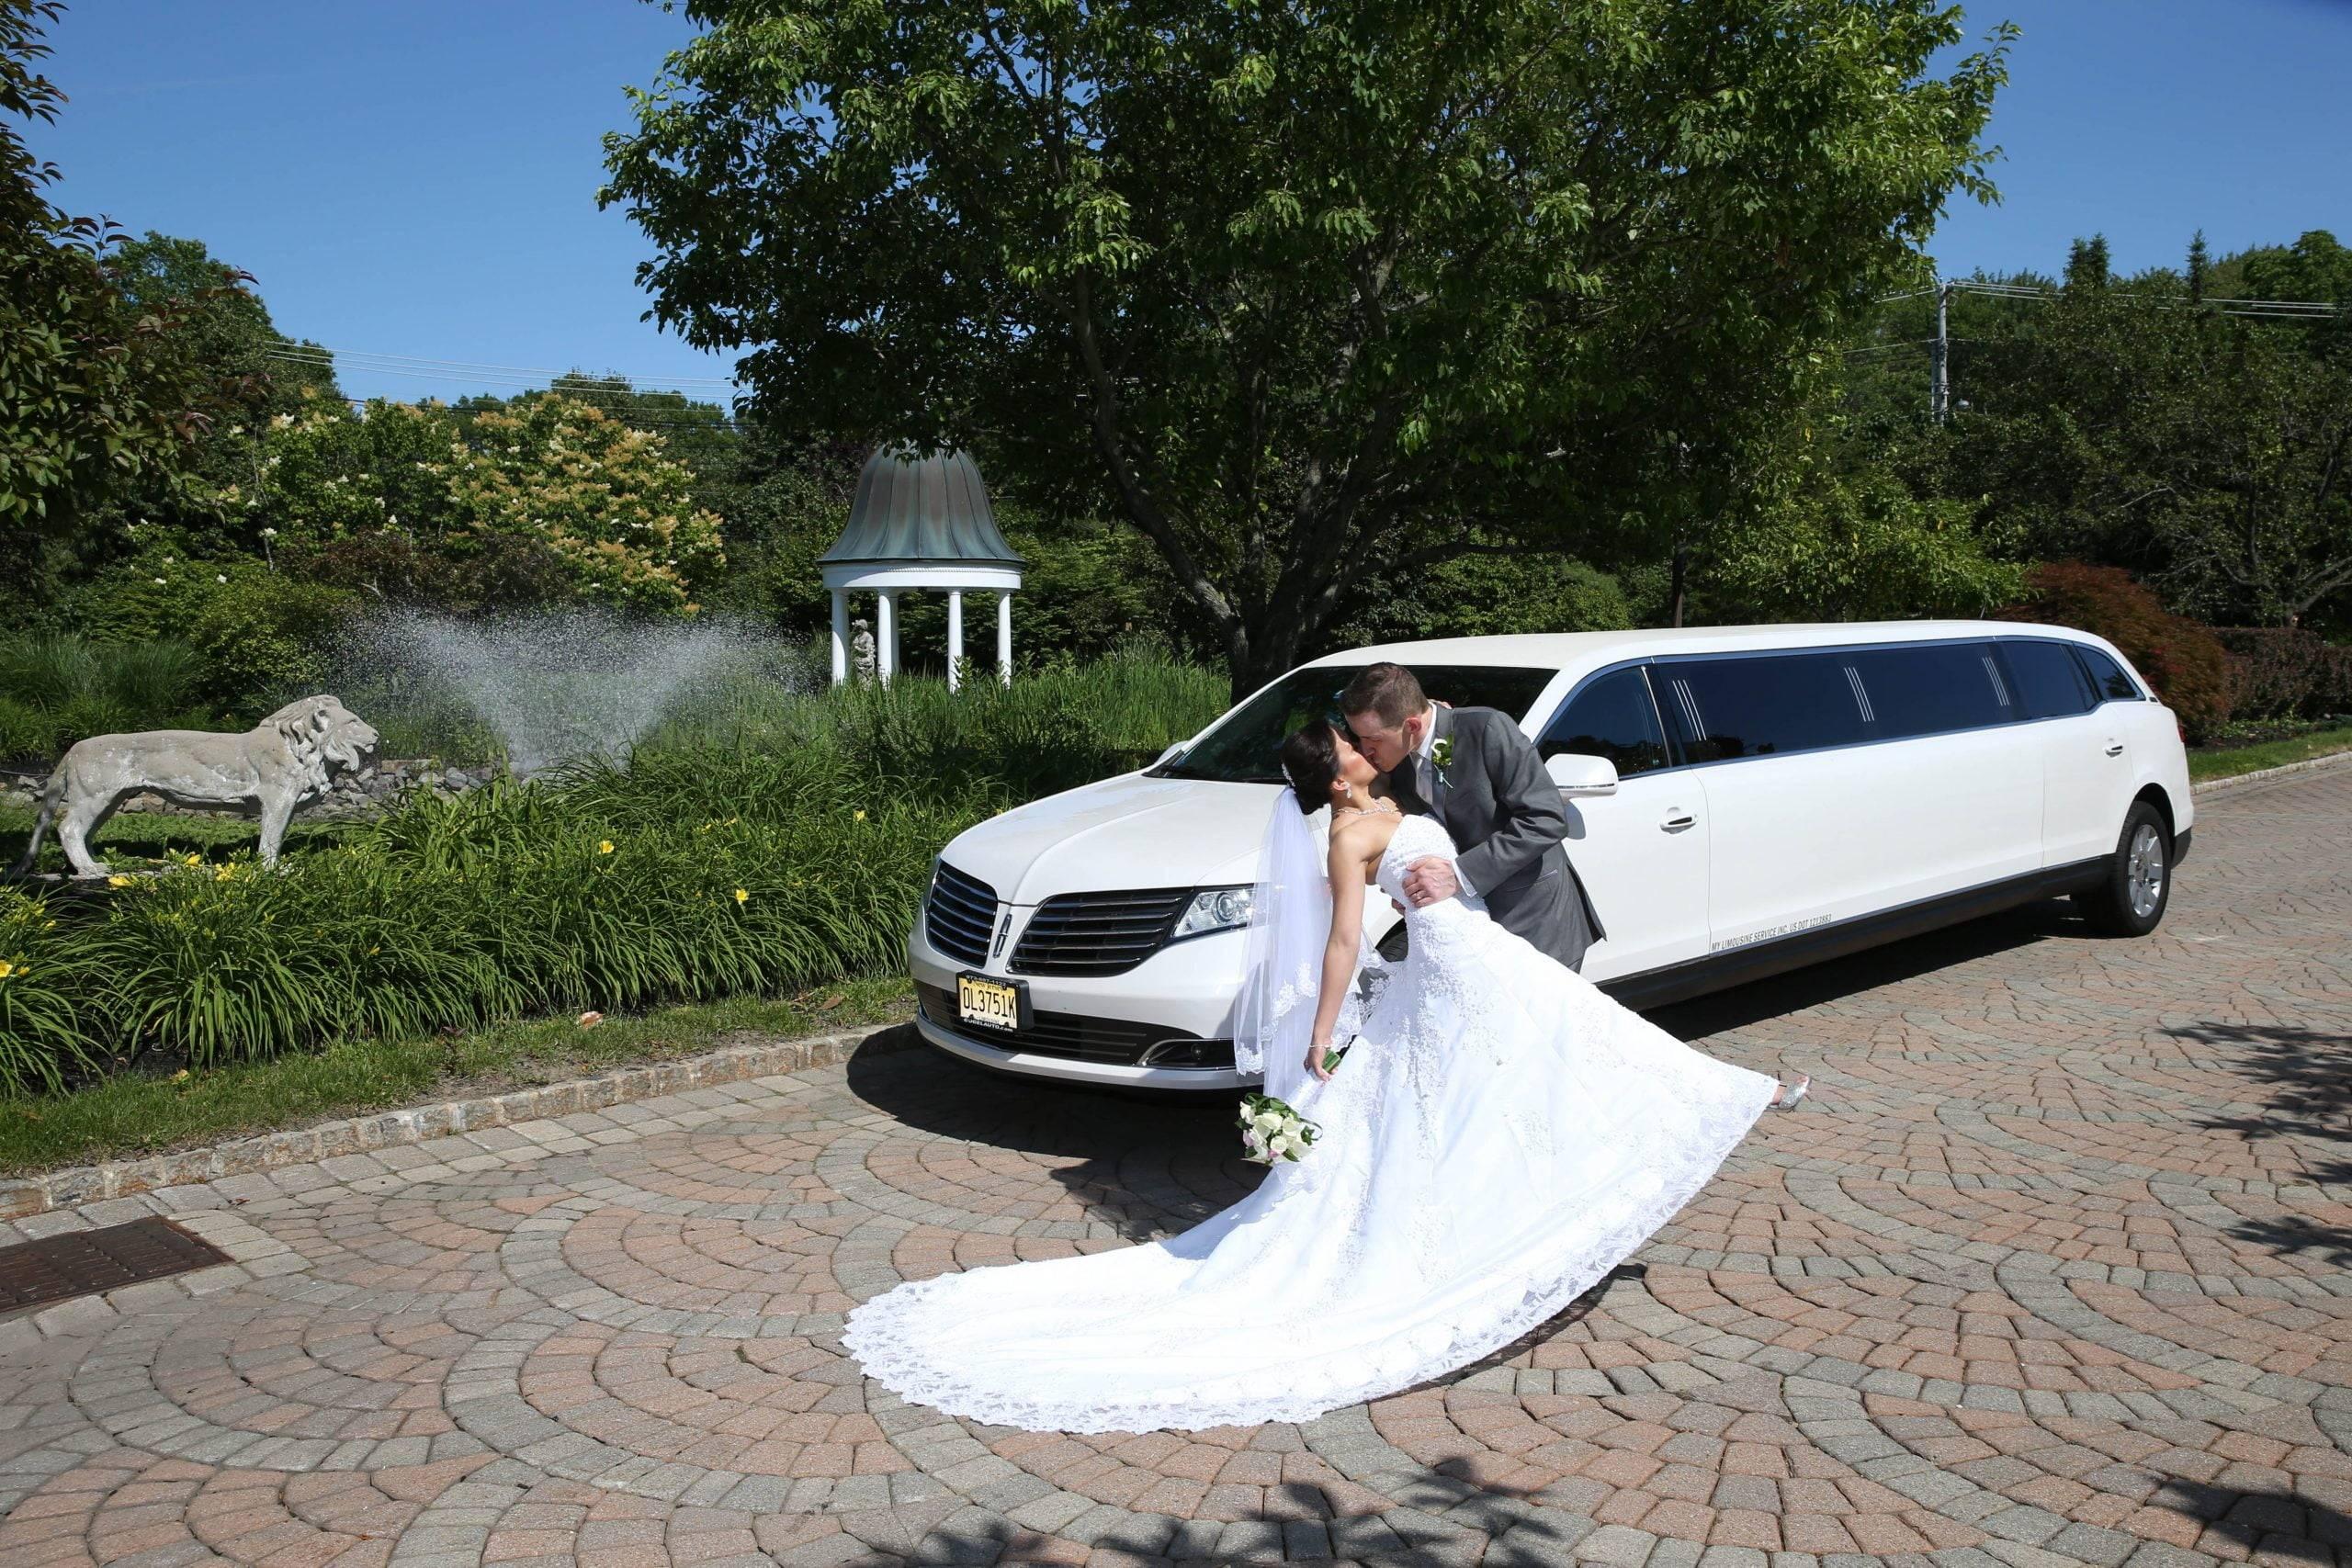 Birchwood Manor kiss by limo